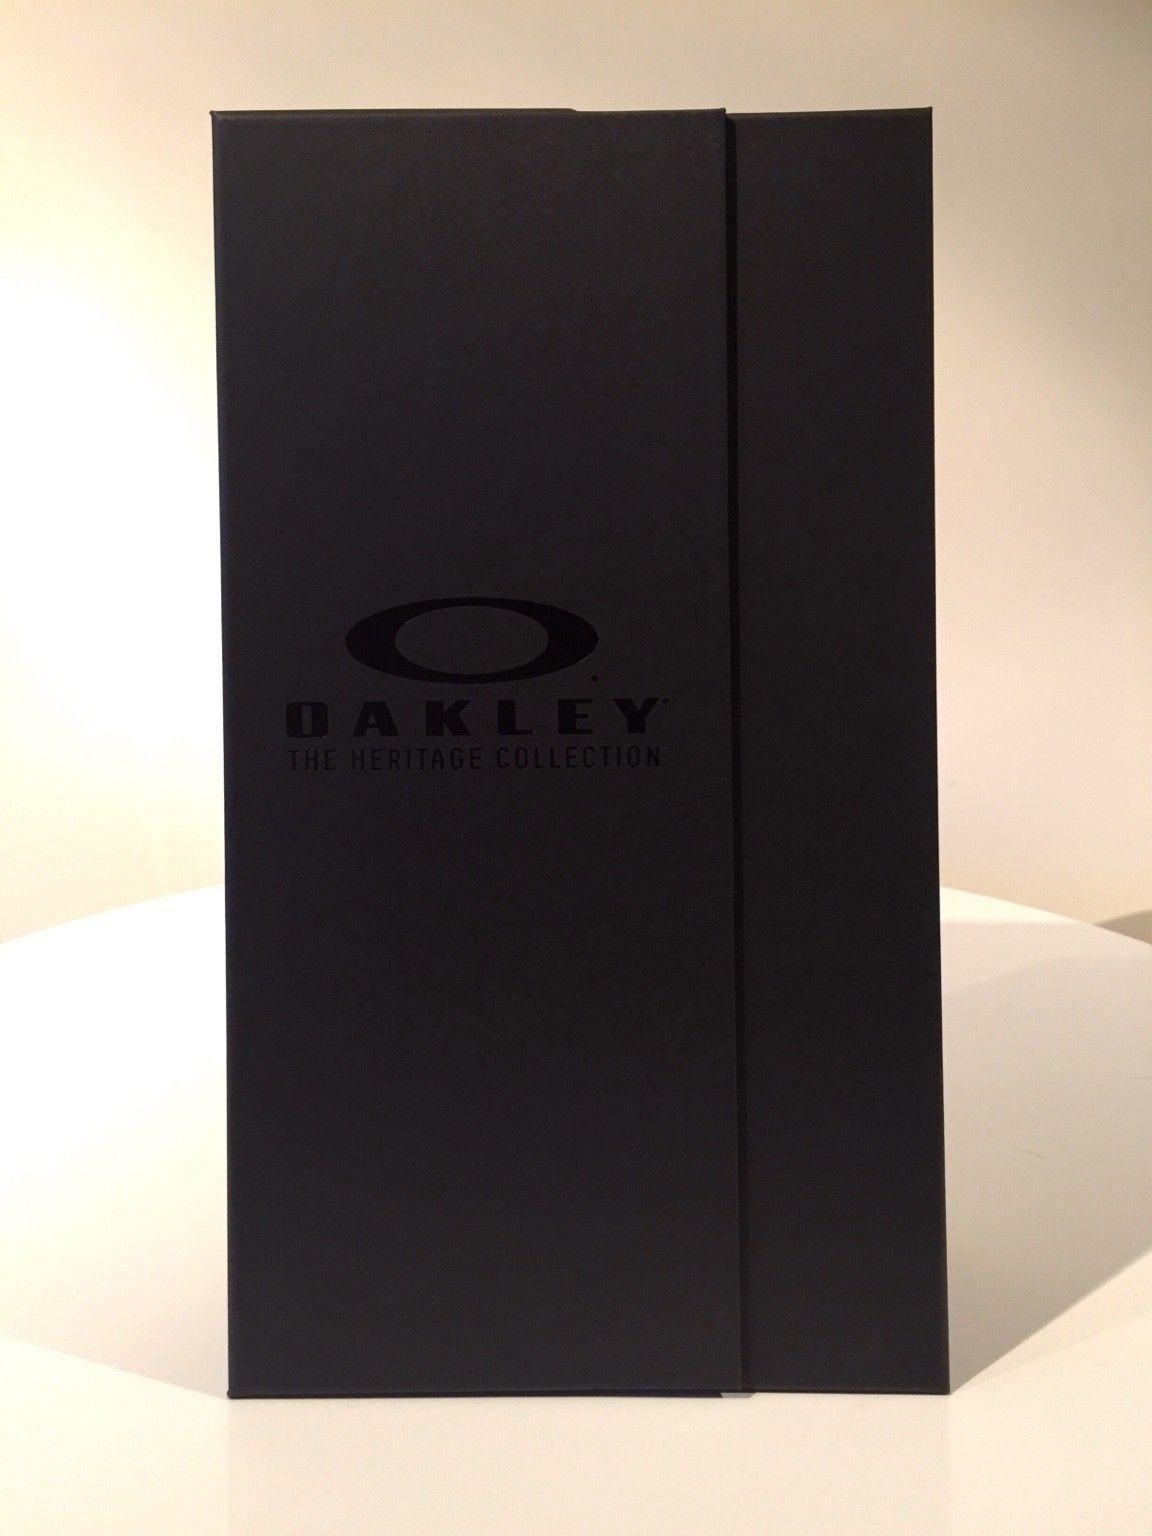 Oakley Heritage Box Set - 24a2d3833a8fe64975ed24db29c2b99a.jpg